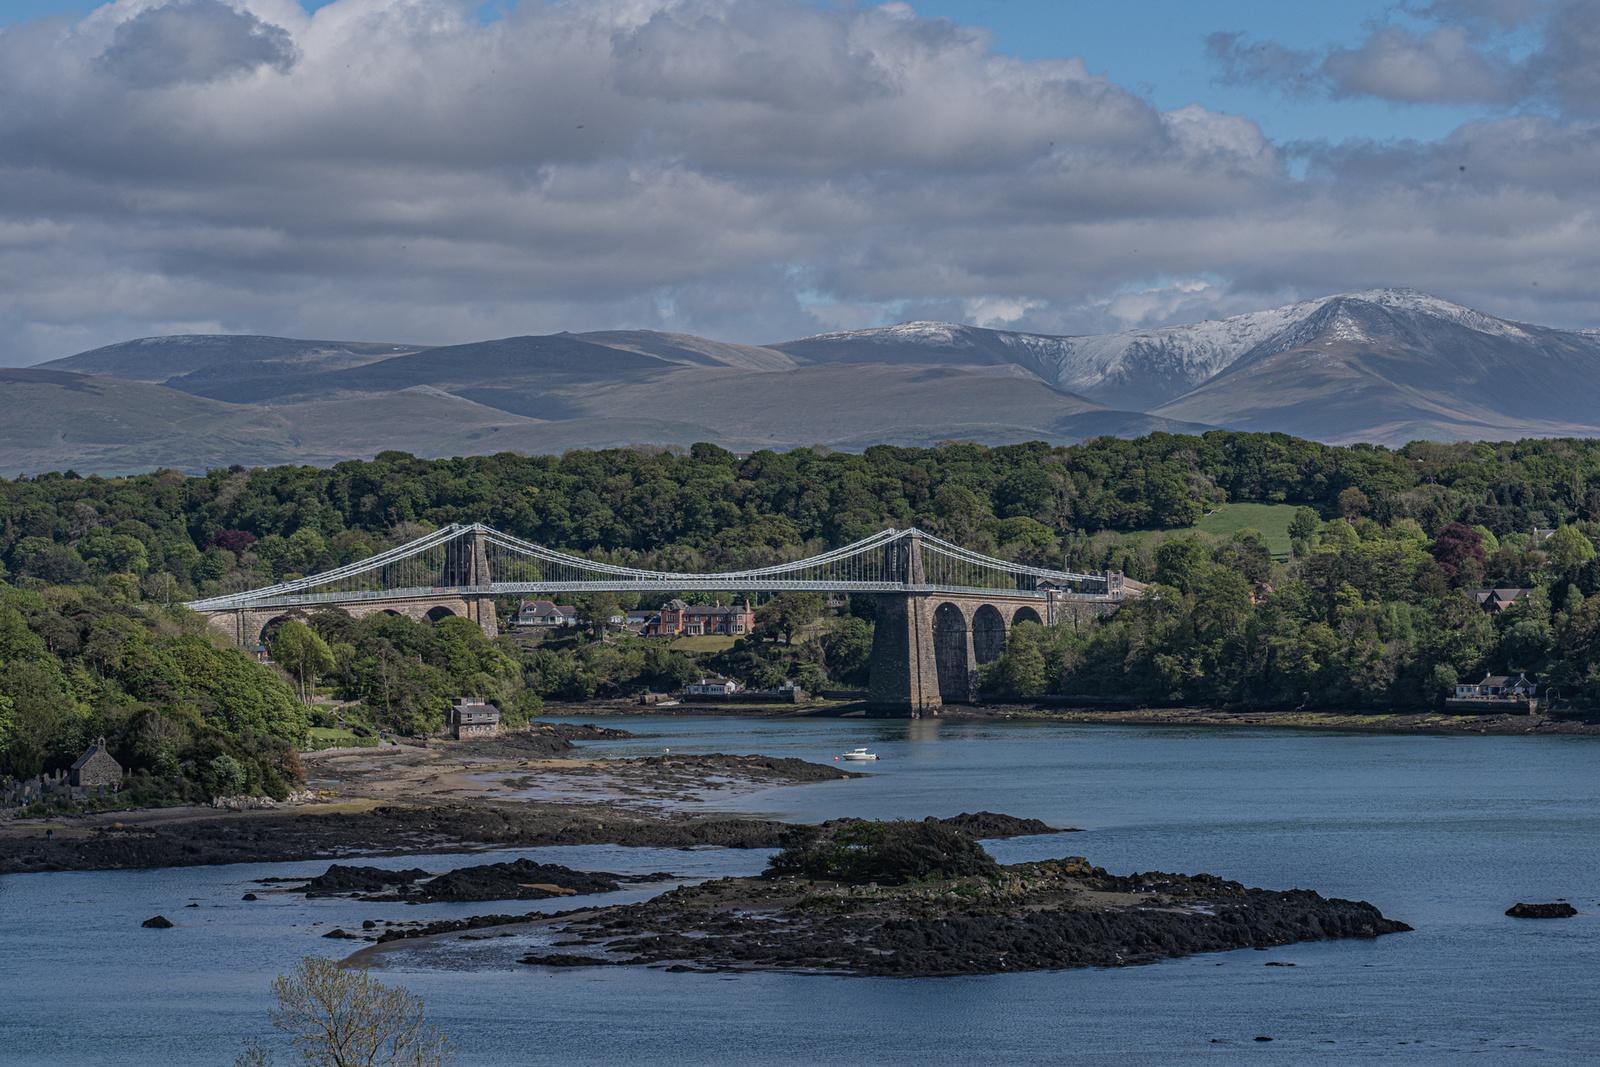 6- Wales